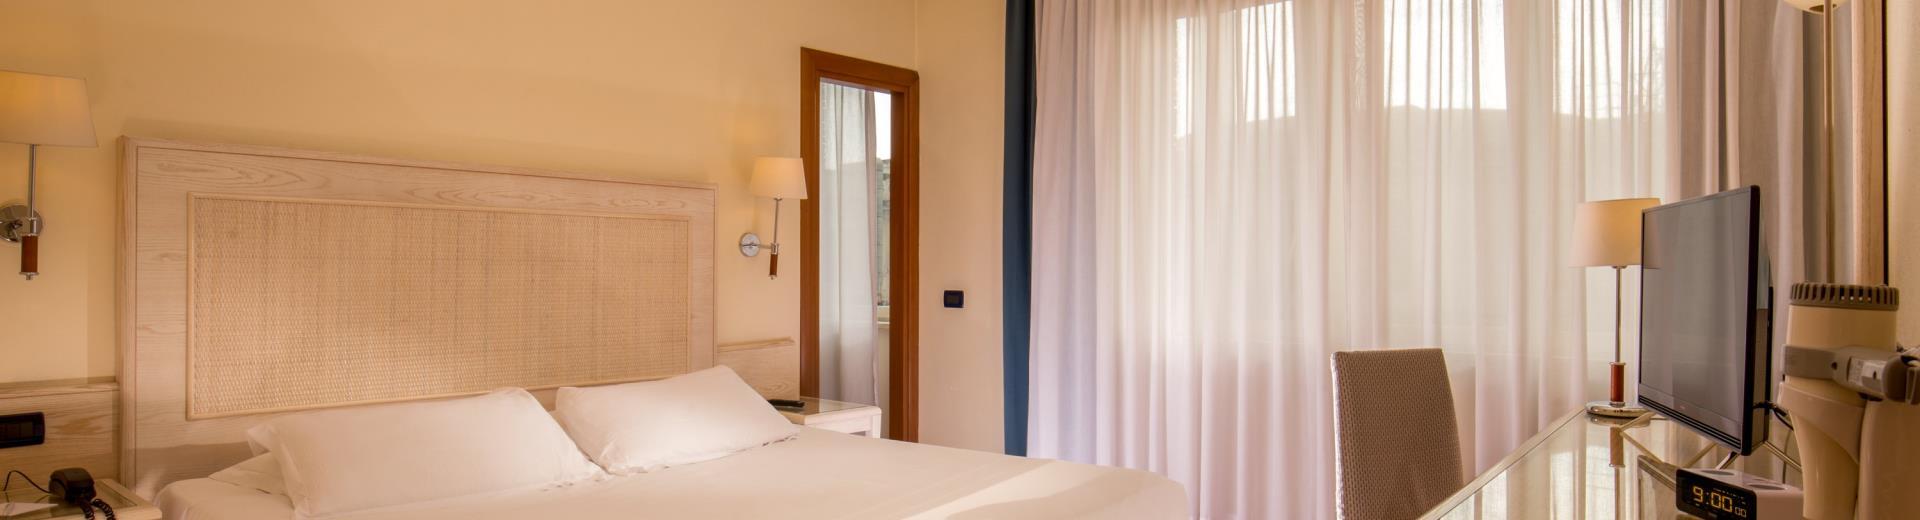 Globus Hotel Roma - Best Western Italia - Prenota Albergo ...